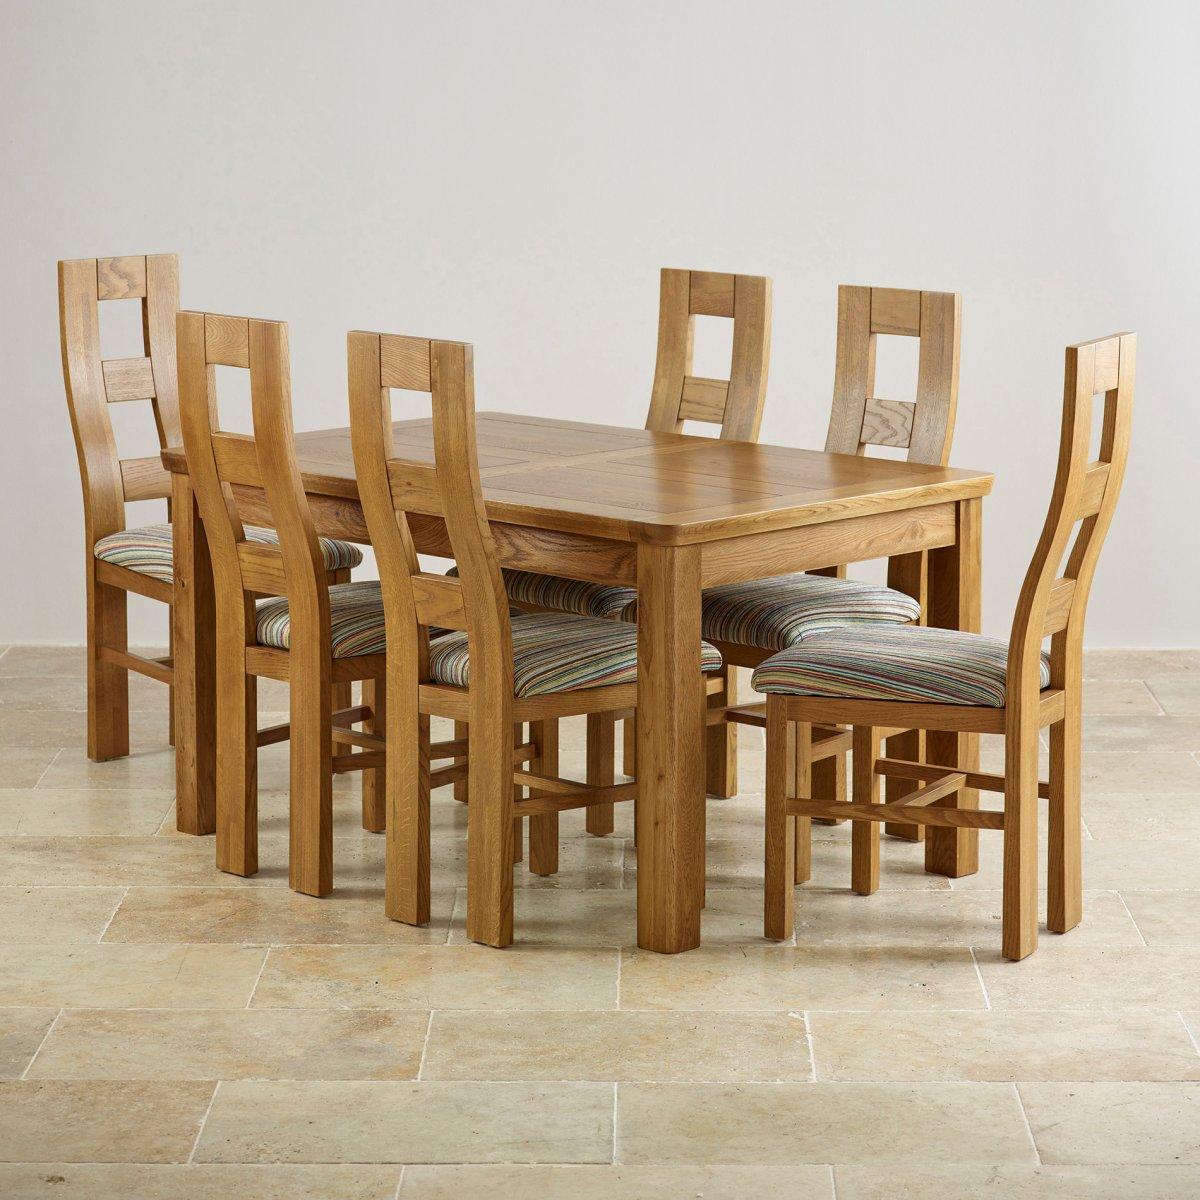 Orrick Extending Dining Set In Rustic Oak: Table + 6 Beige